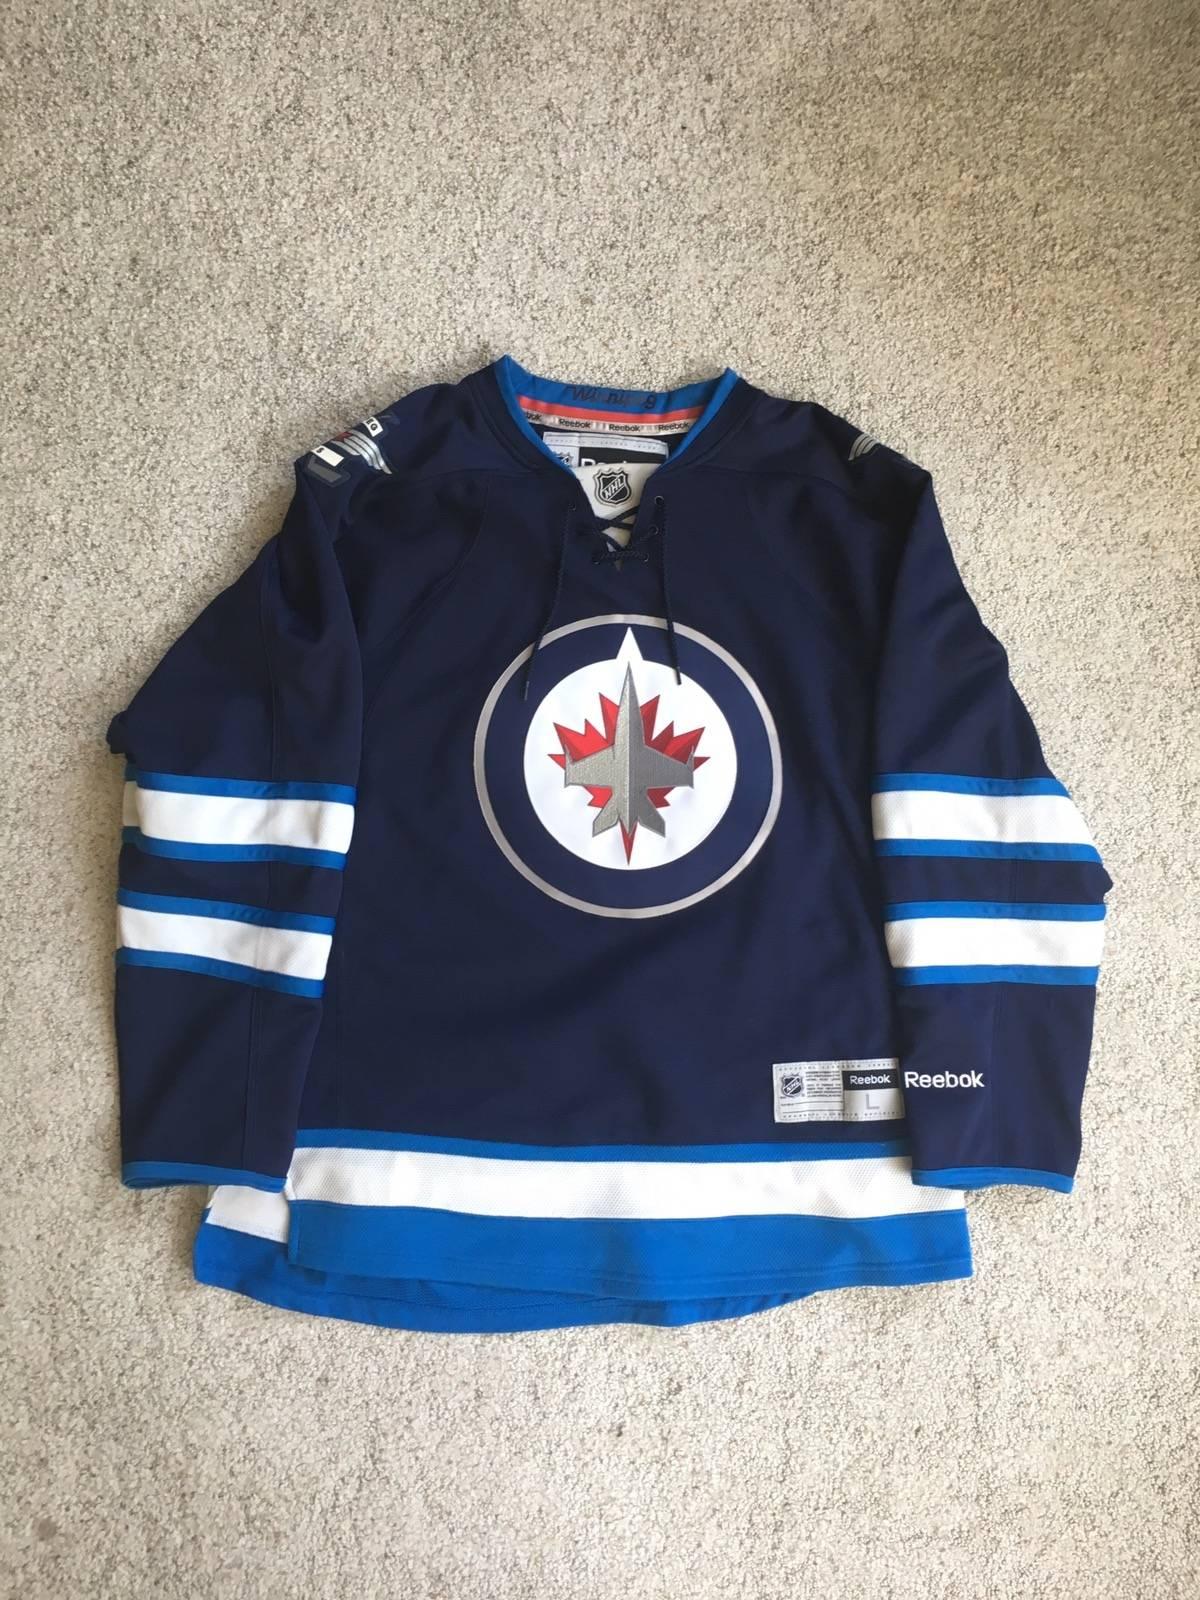 official photos 5cc49 66084 Reebok × Vintage Winnipeg Jets Nhl Reebok Jersey Size L $44